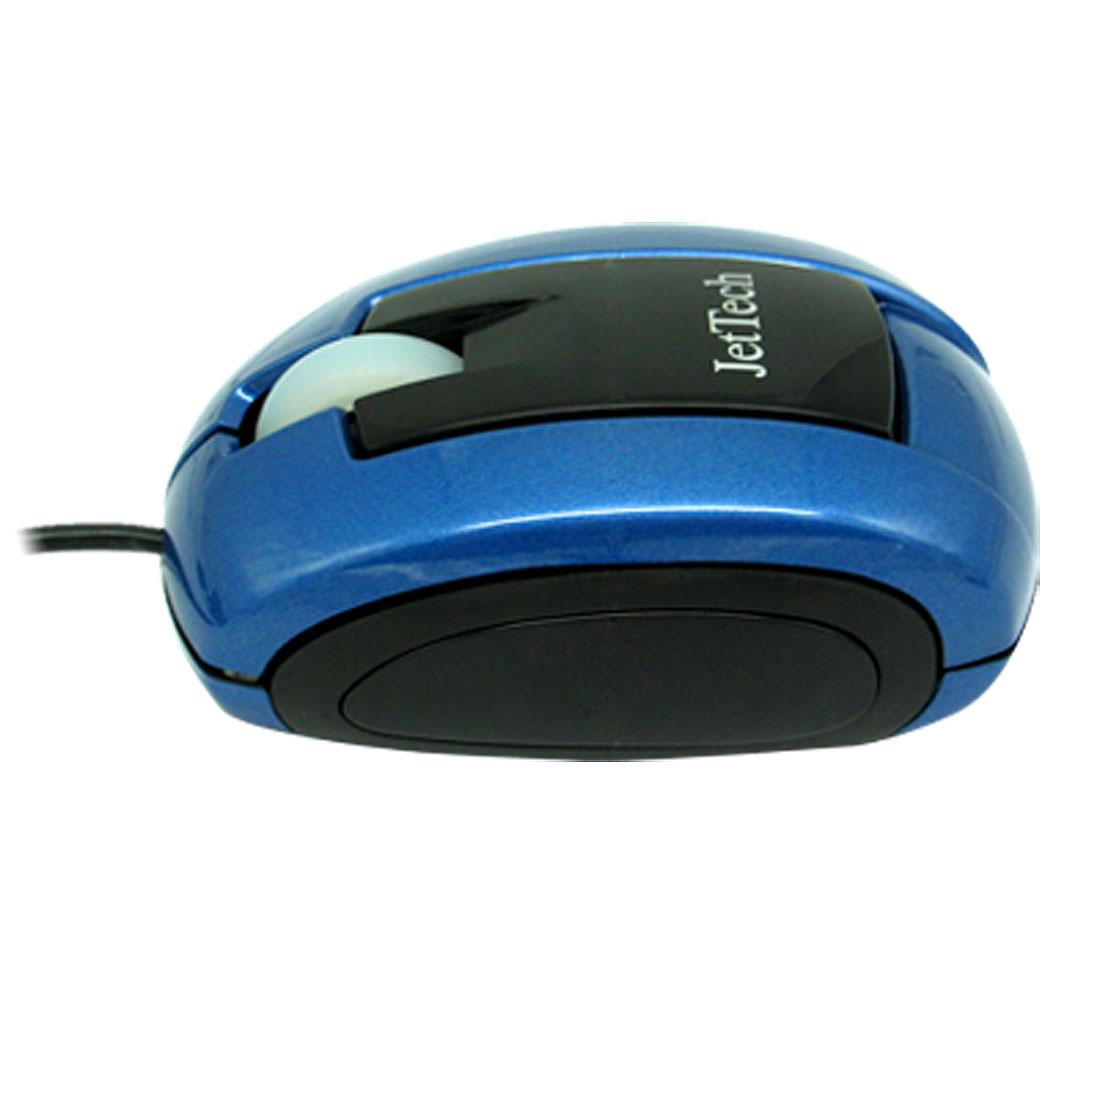 Vista PC Laptop Computer 3D Optical Scroll Wheel PS/2 USB Blue Mouse